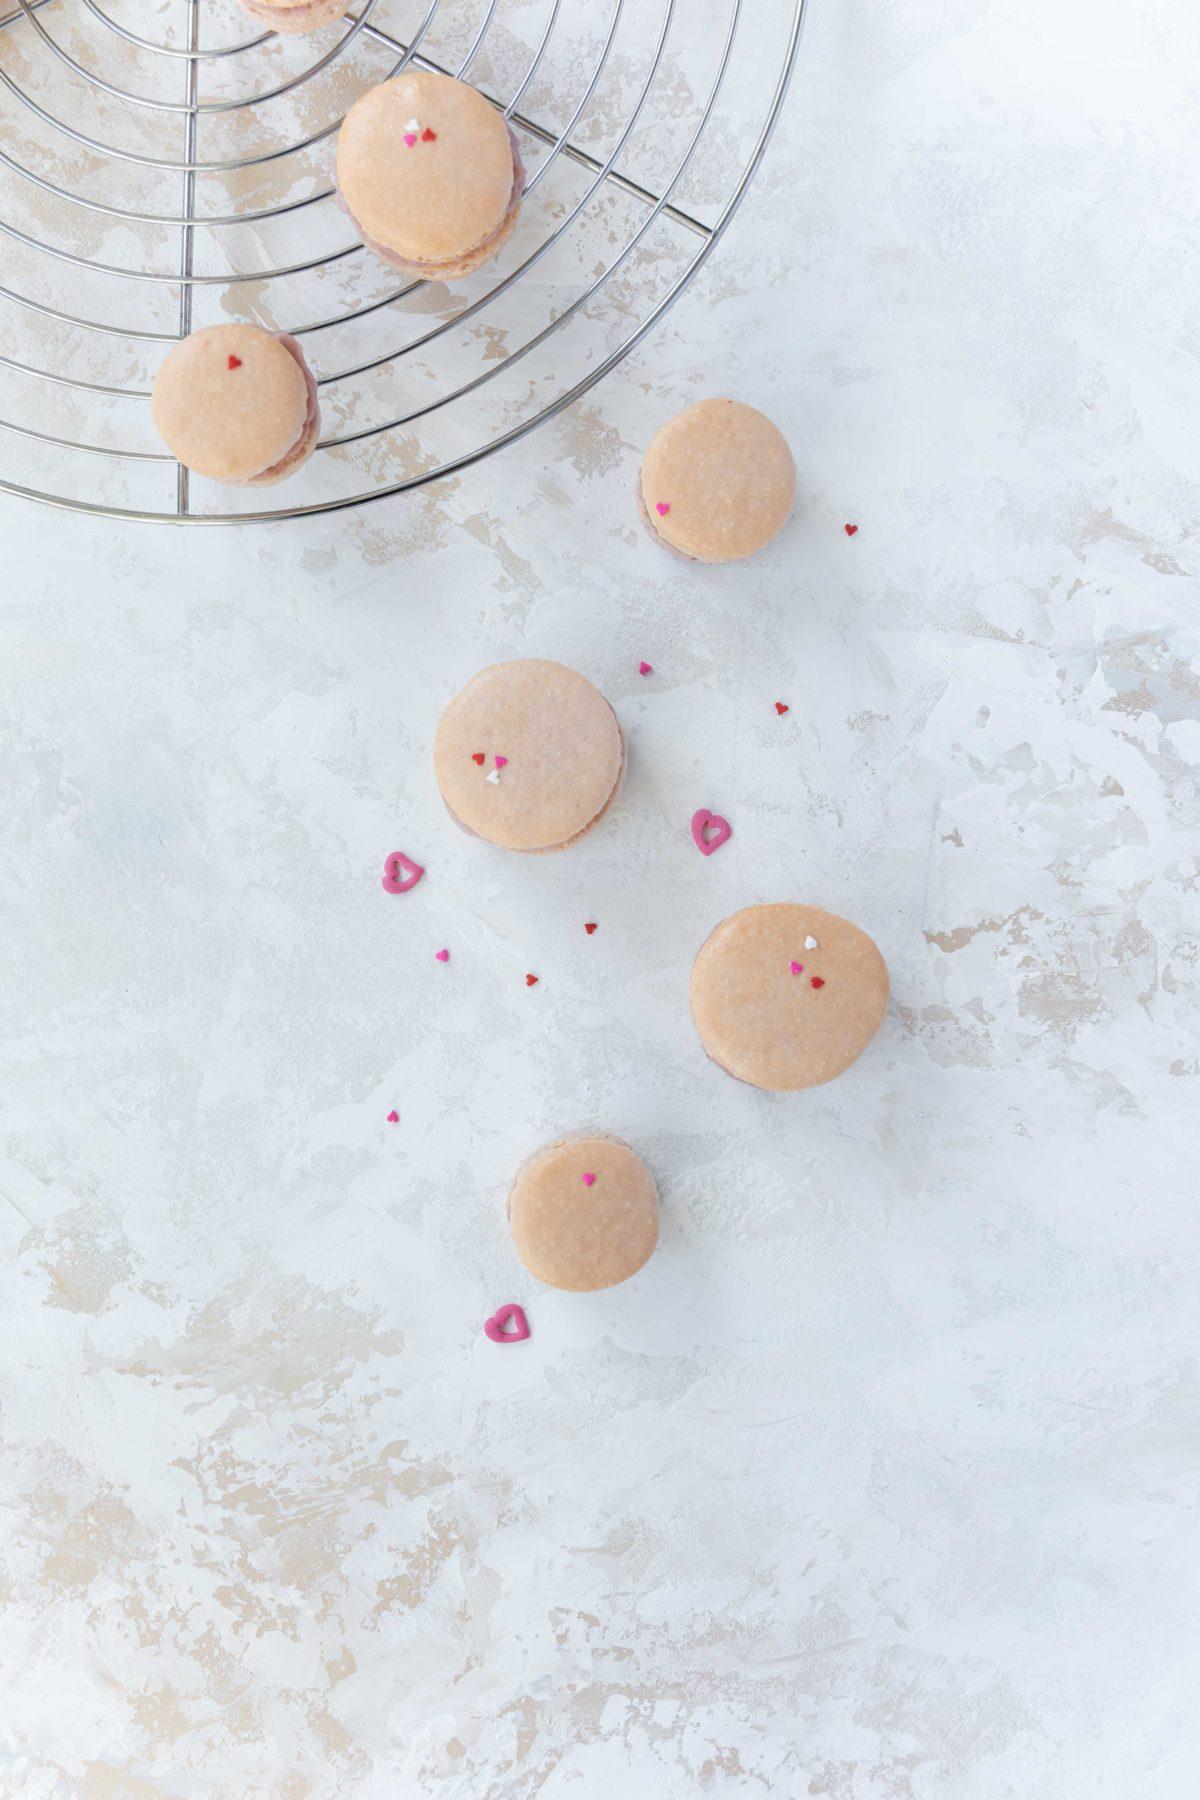 Himbeer Macarons zum Valentinstag / raspberry Macarobs for valentines day by https://babyrockmyday.com/himbeer-macarons/